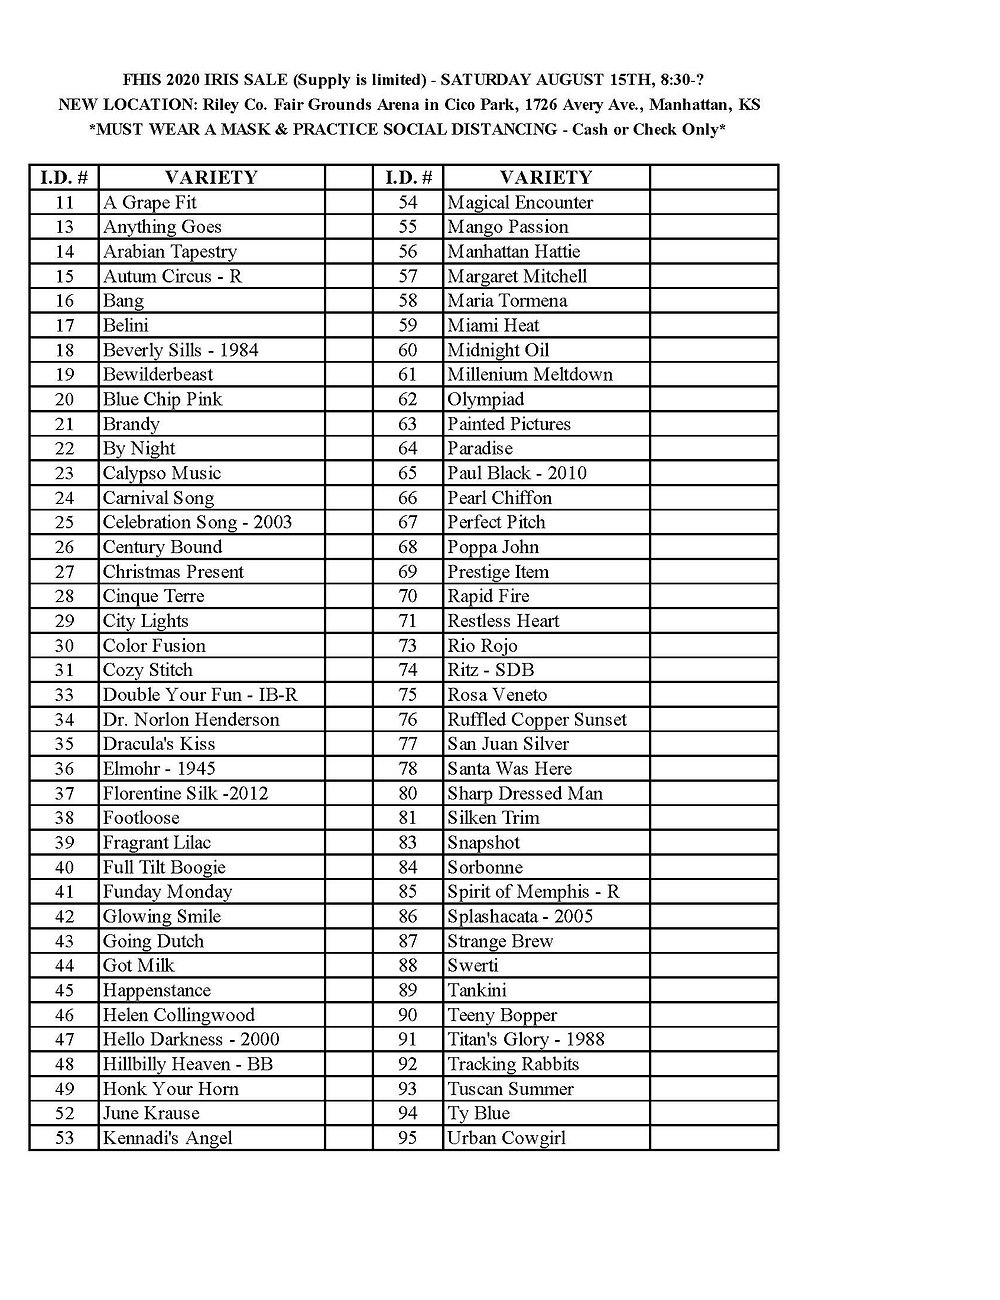 2020 Iris Sale List_Page_1.jpg